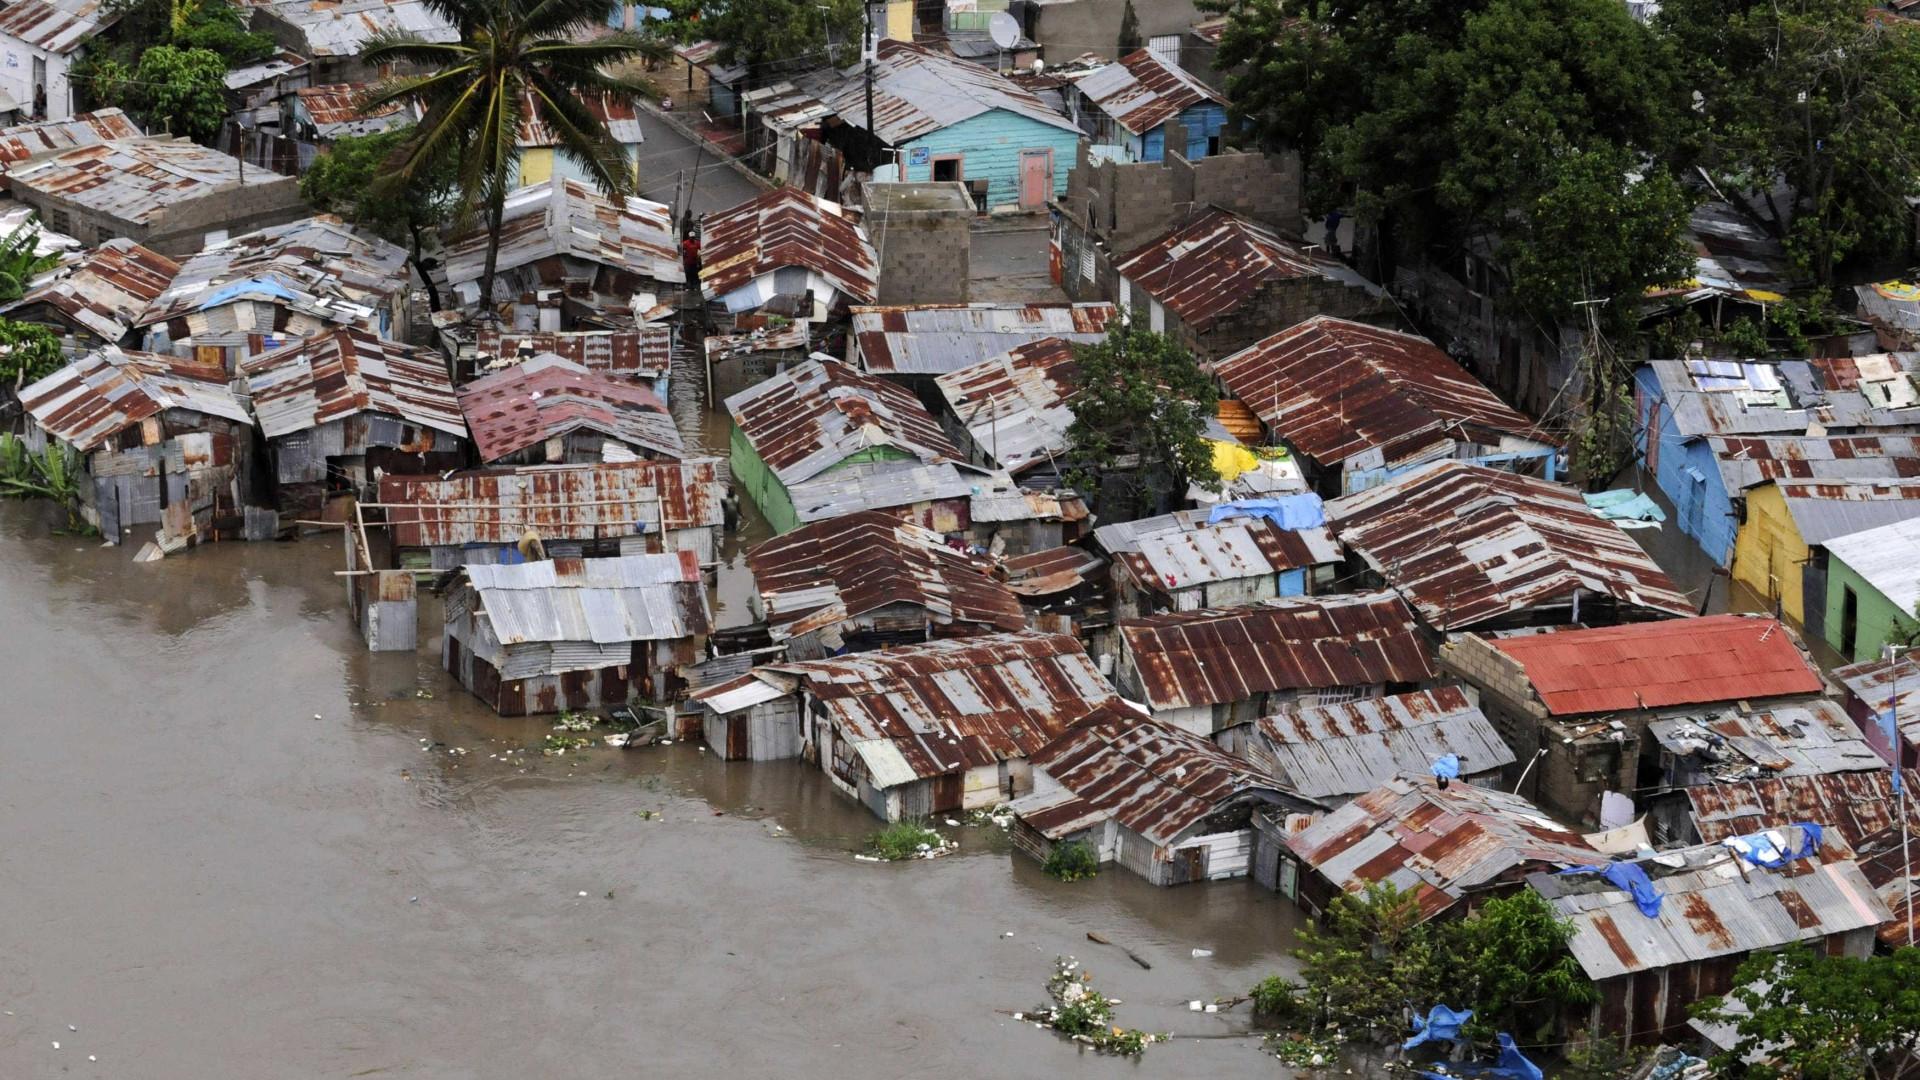 Dilúvio na República Dominicana:  42 mil são evacuados